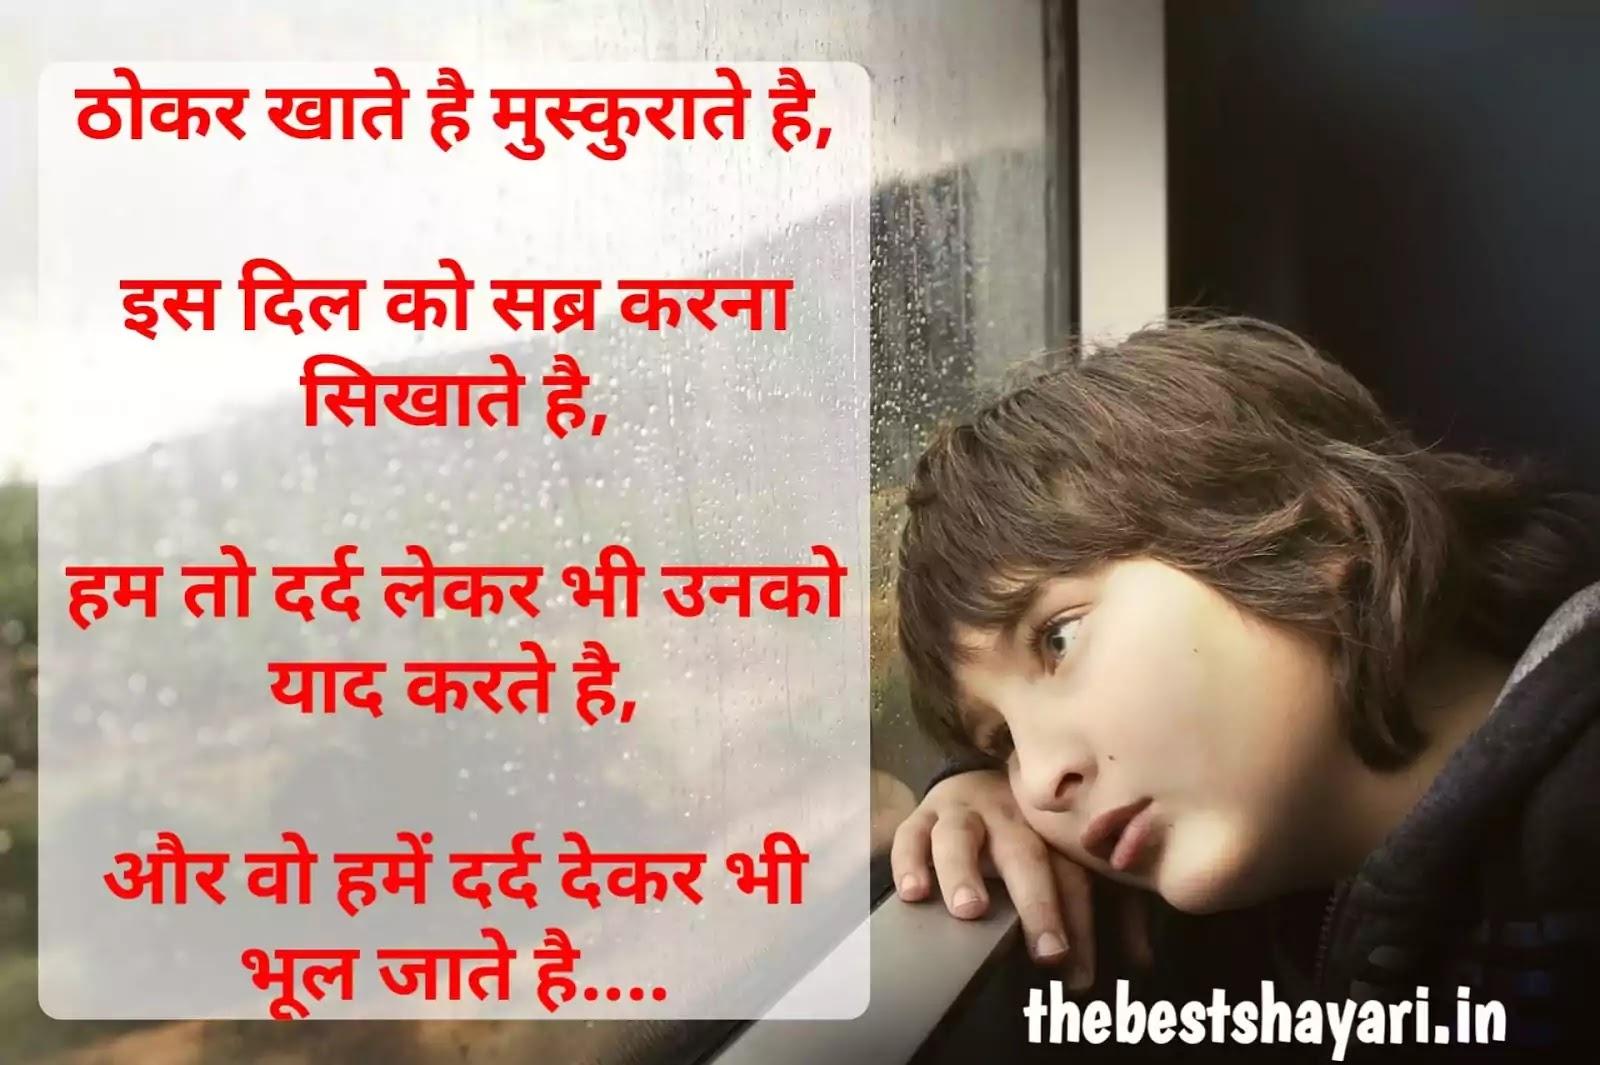 Dard shayari Hindi me